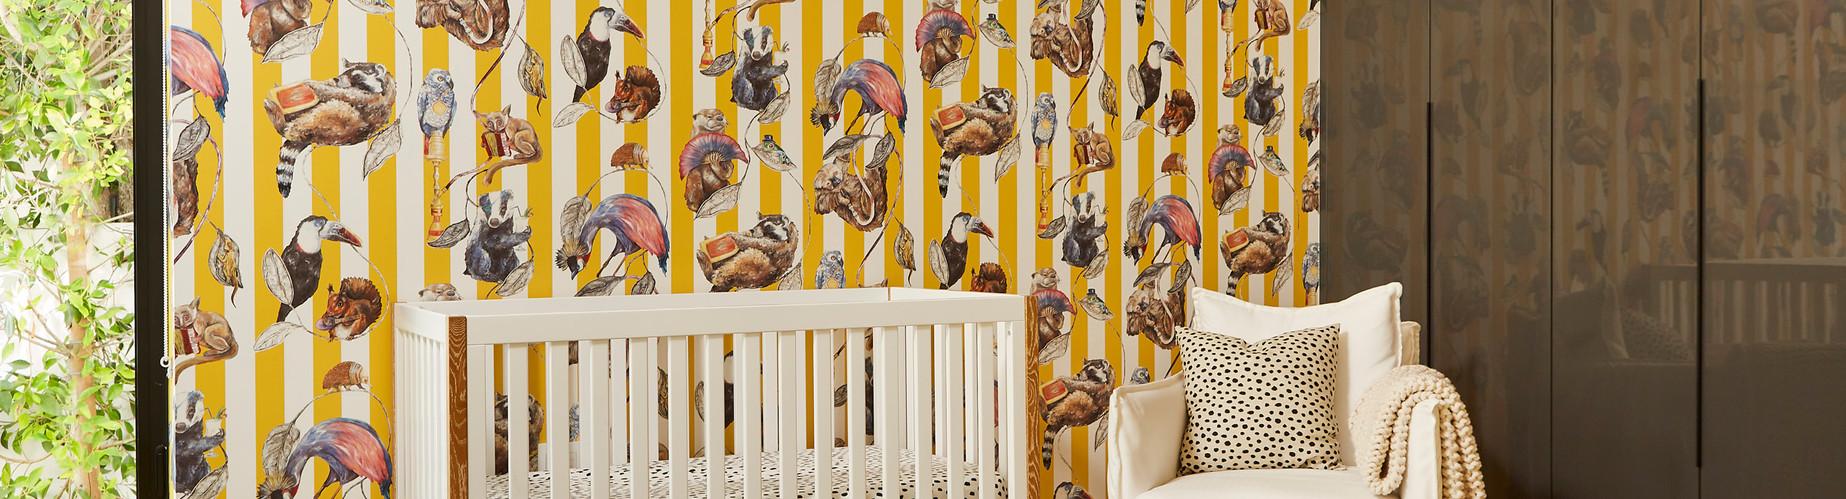 Studio City Hamptons Nursery.jpg